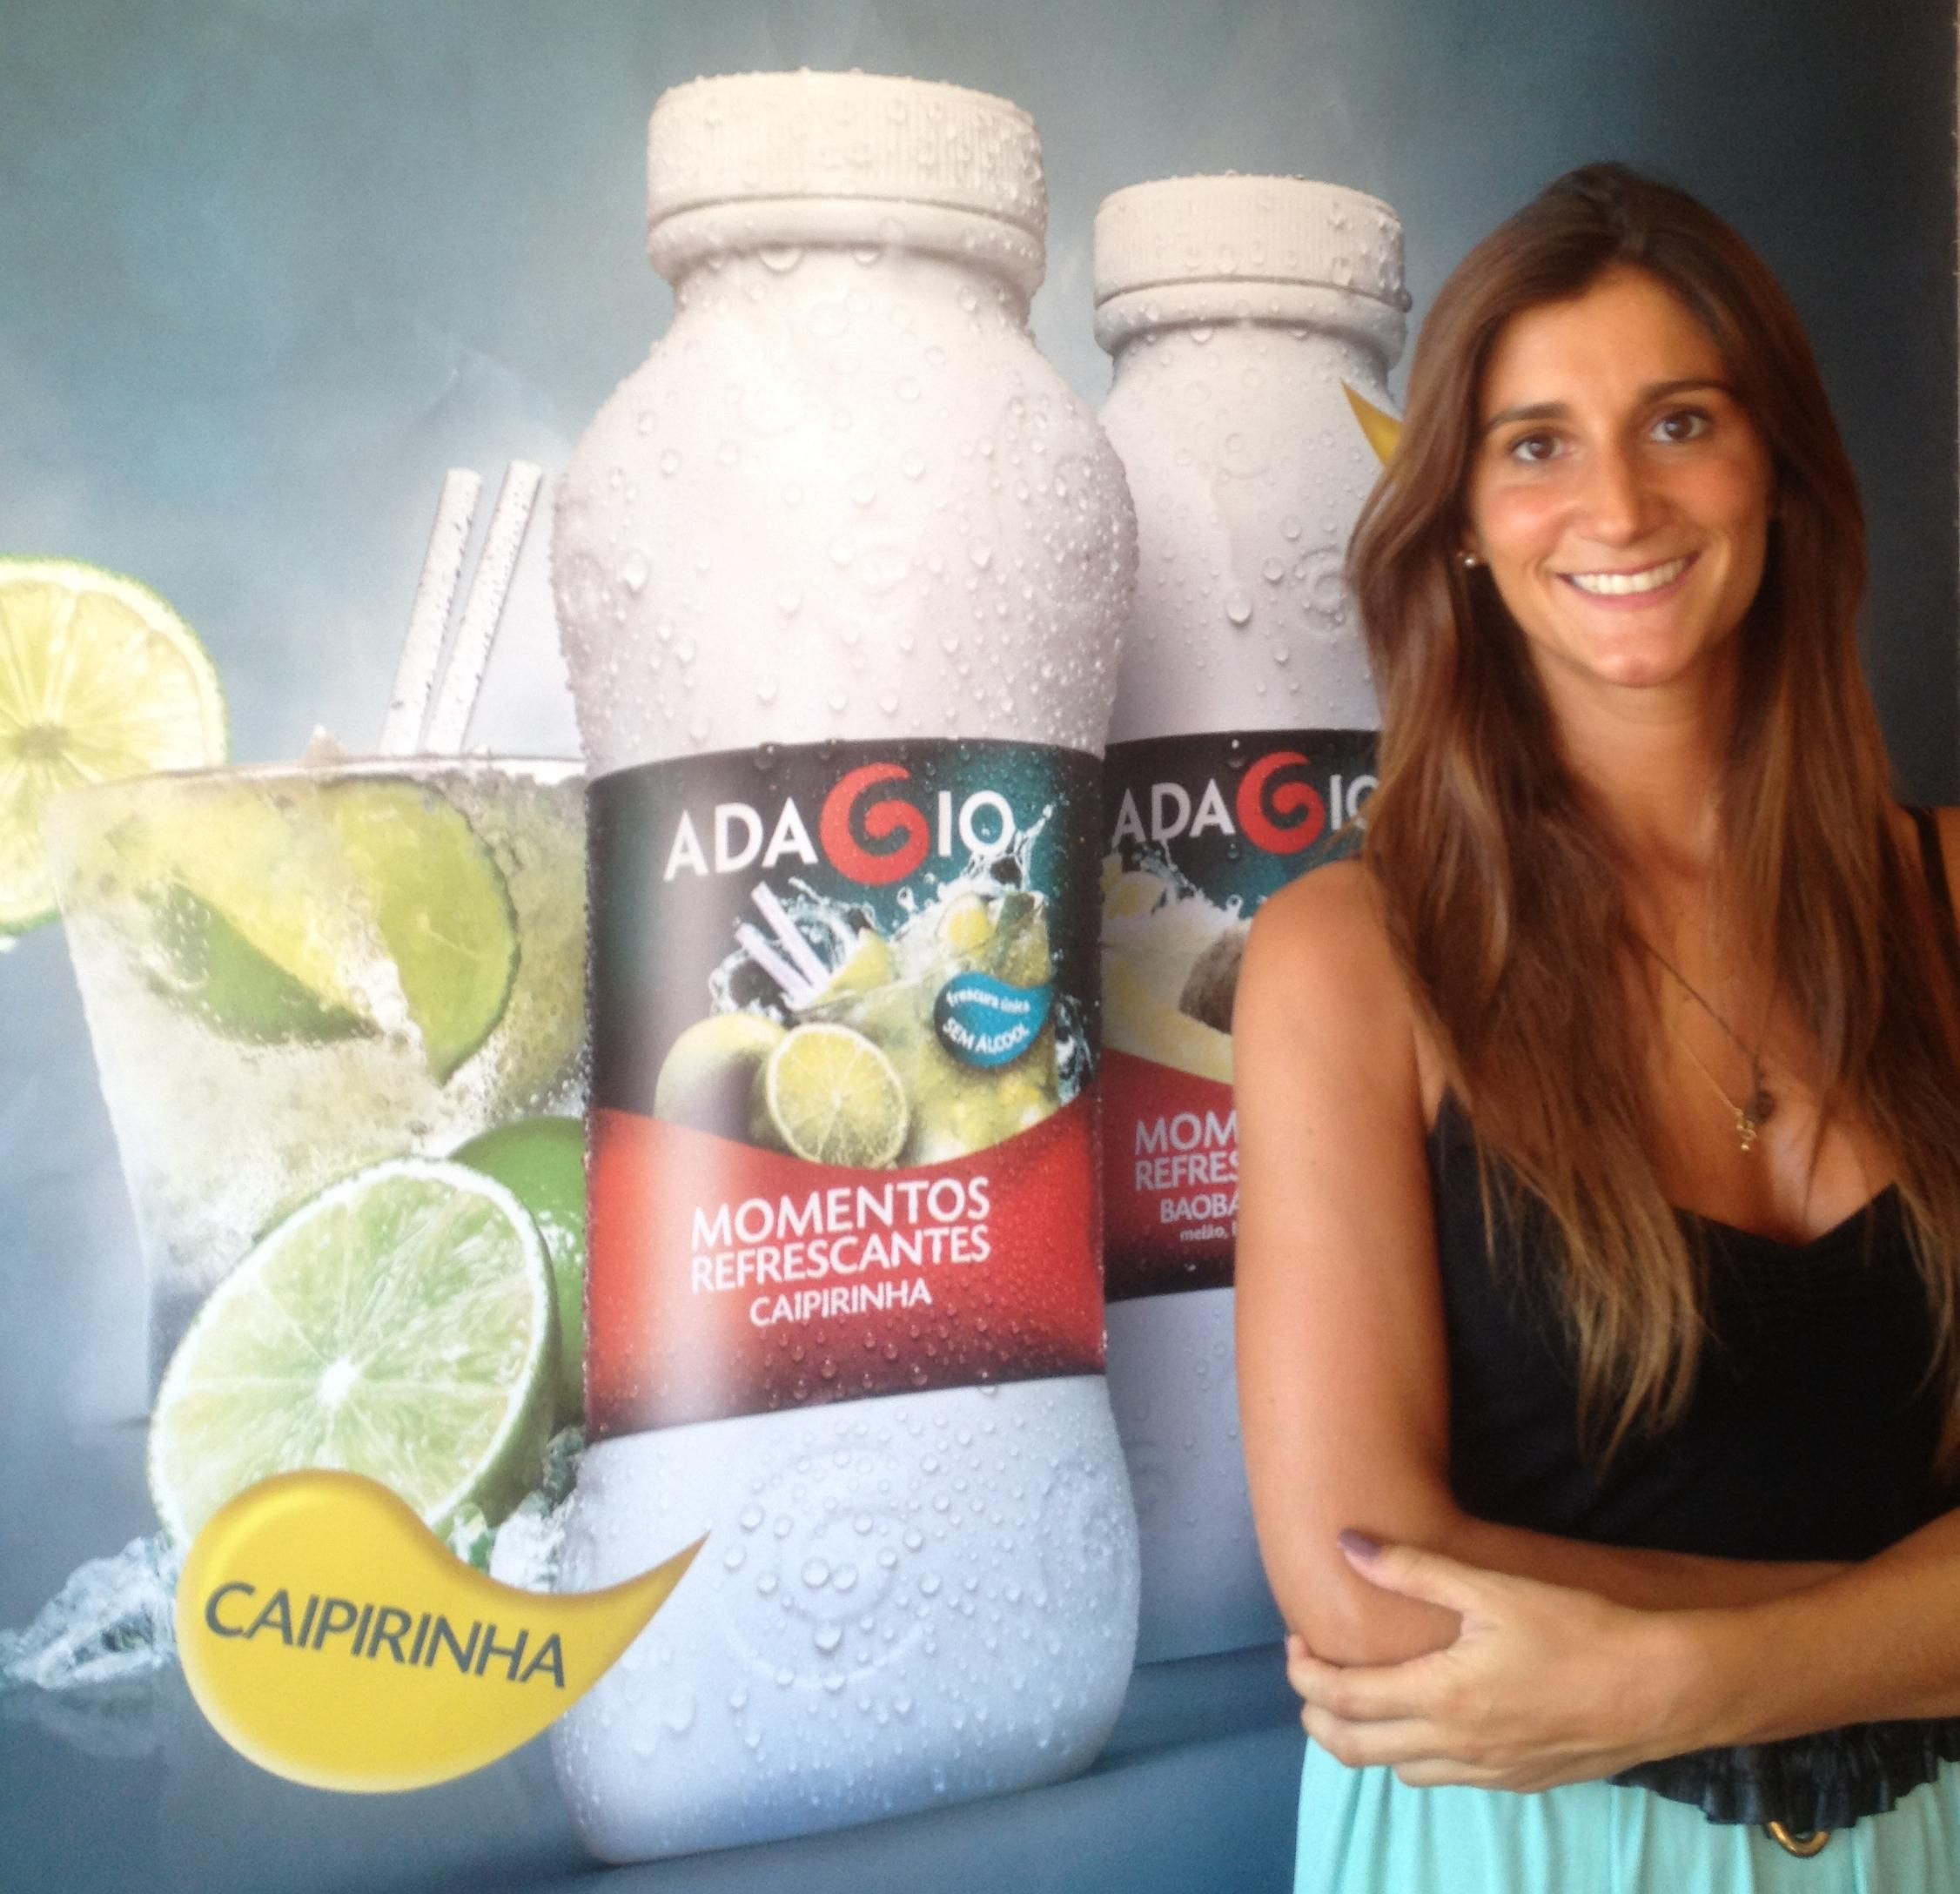 Catarina Monteiro, Gestora de Produto Adagio